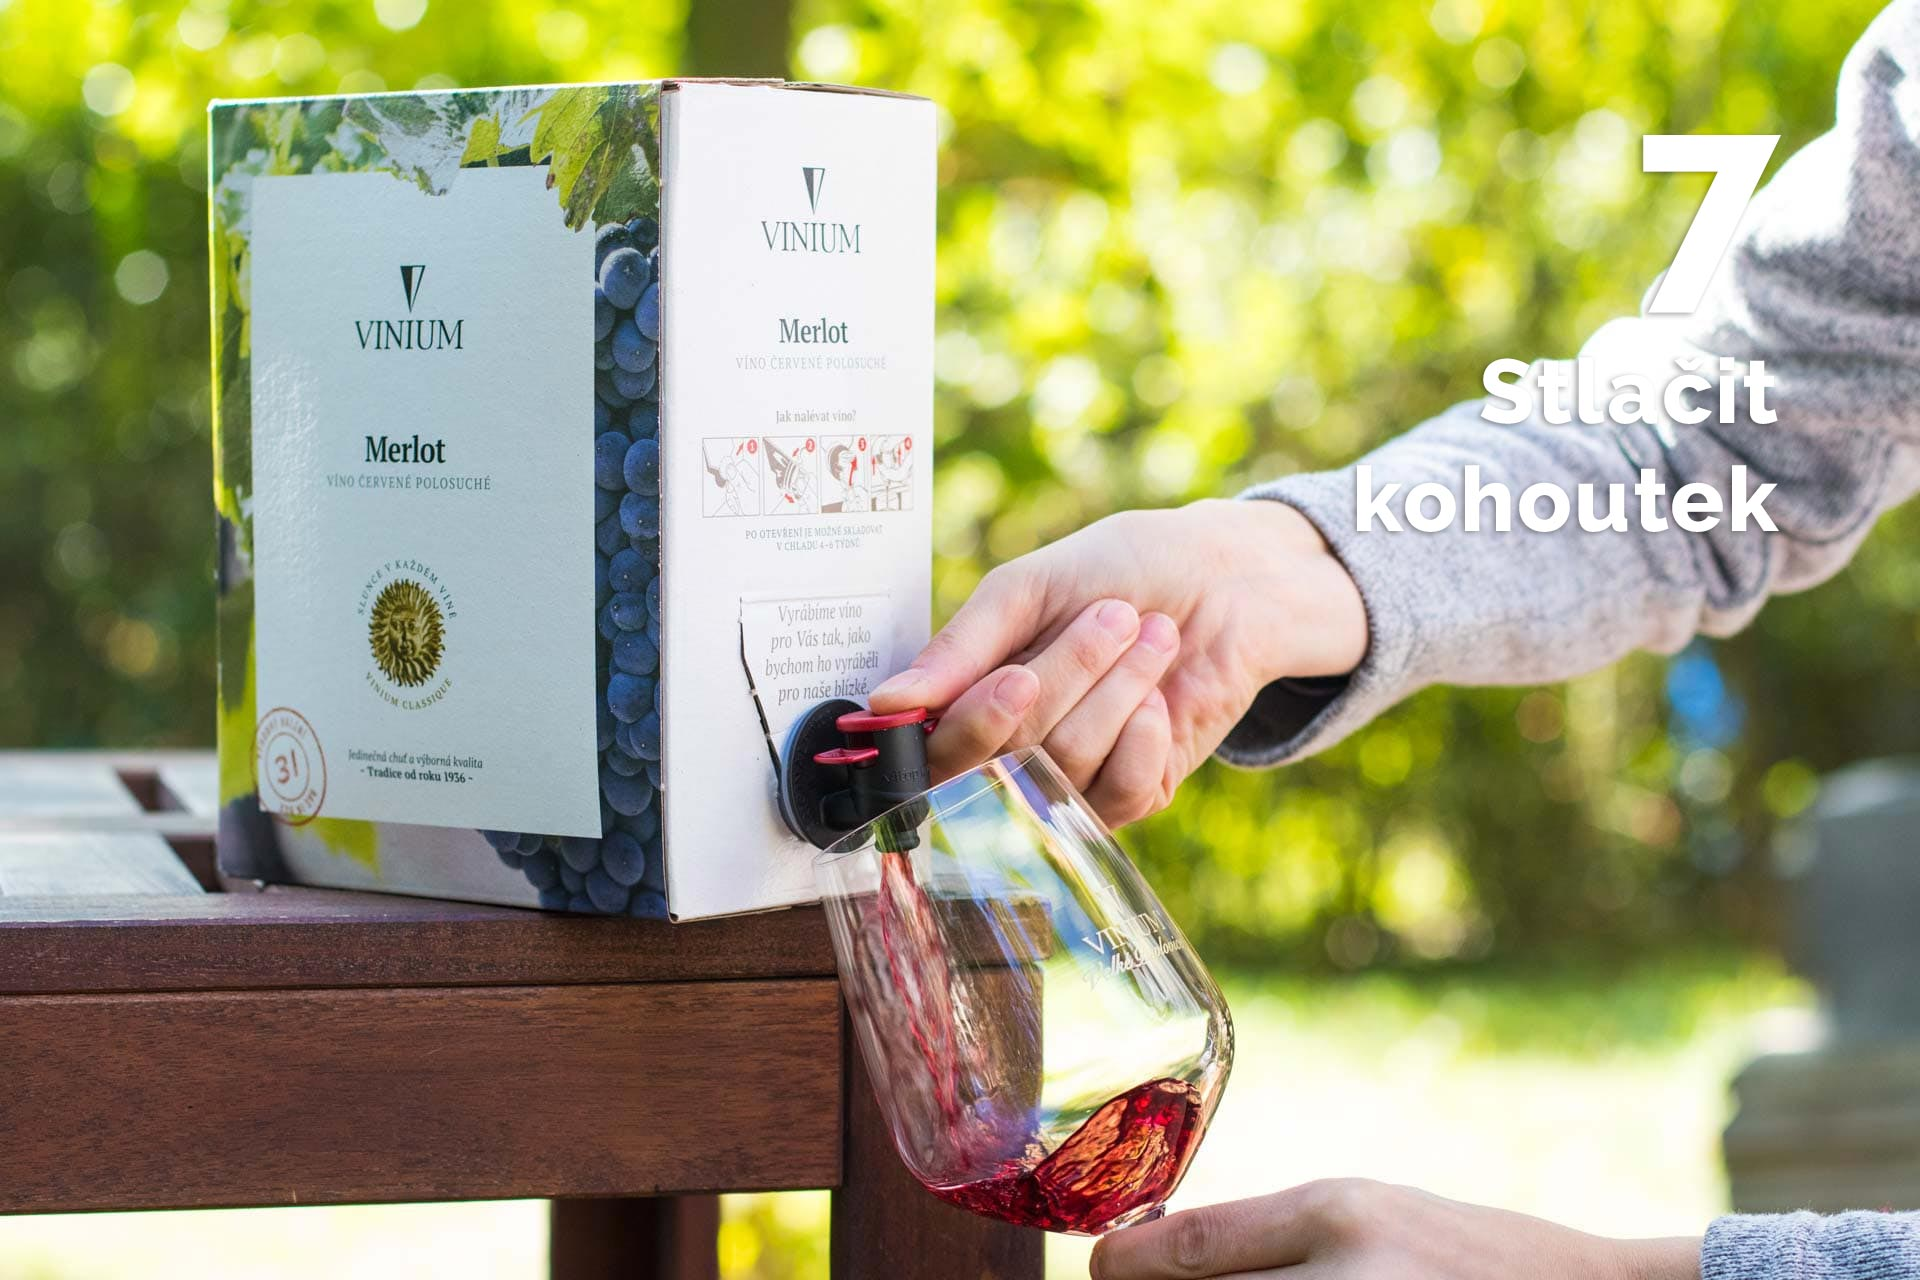 jak otevřít bag in box 7, vinium, návod, víno